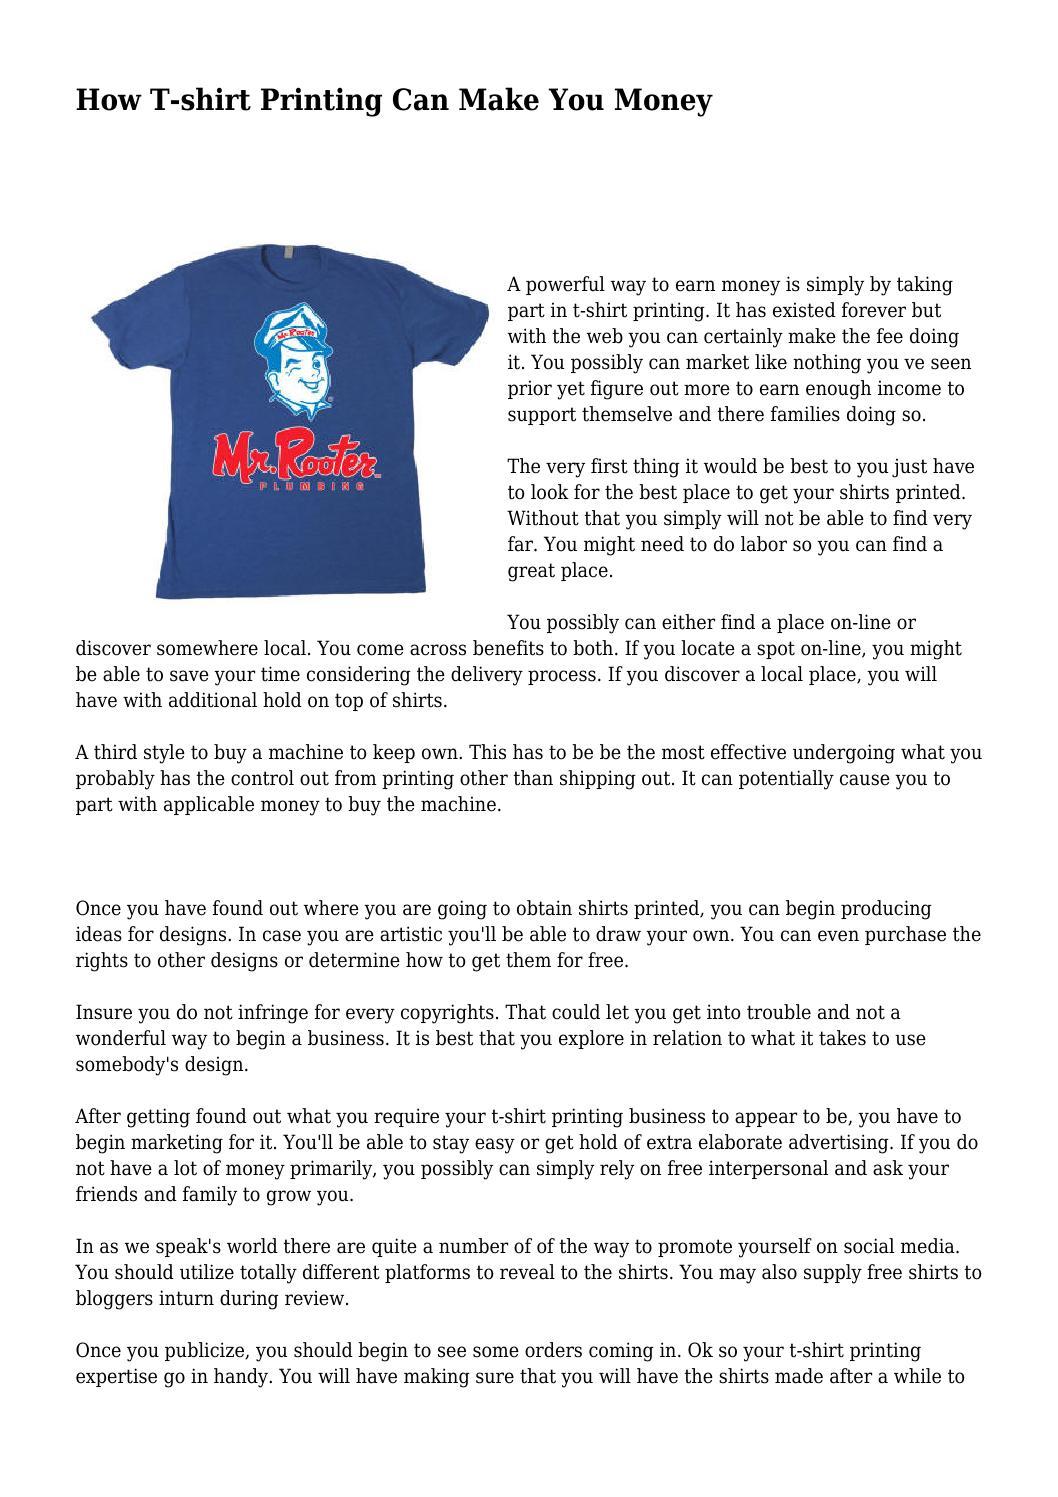 c27680e0b How T-shirt Printing Can Make You Money by thinkablecushio68 - issuu